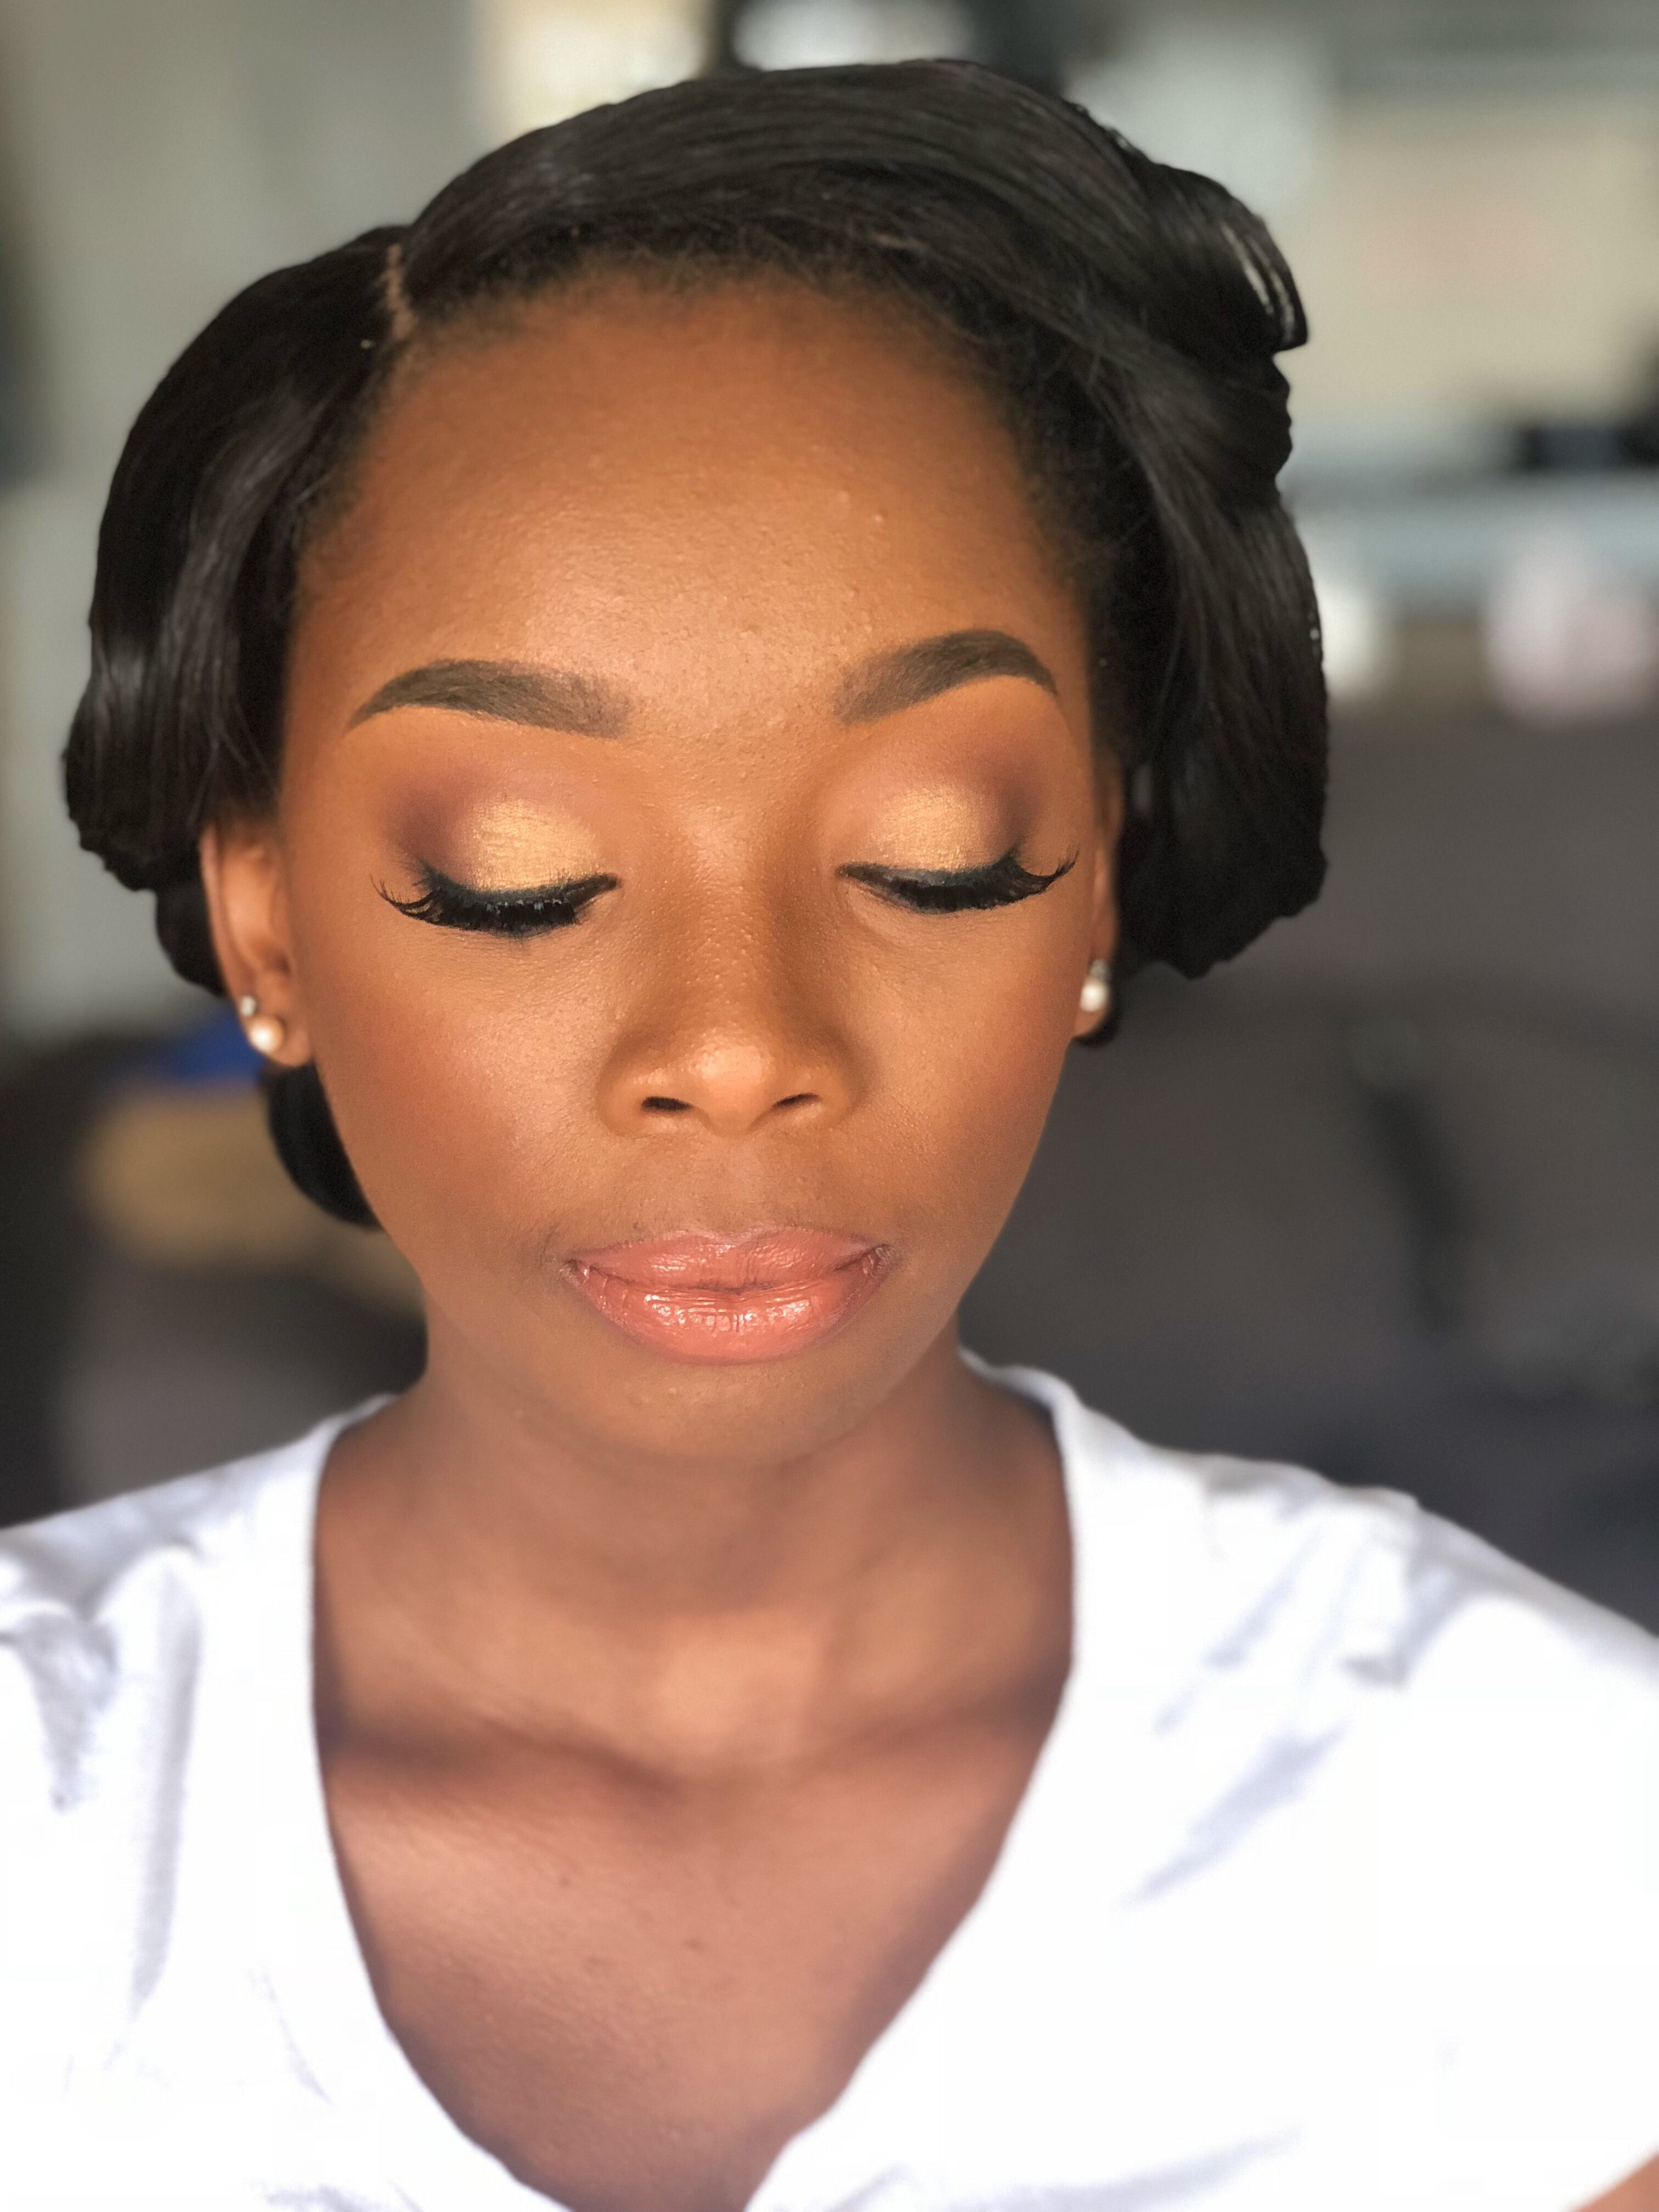 Senior Portraits Makeup Senior portrait makeup, Glam